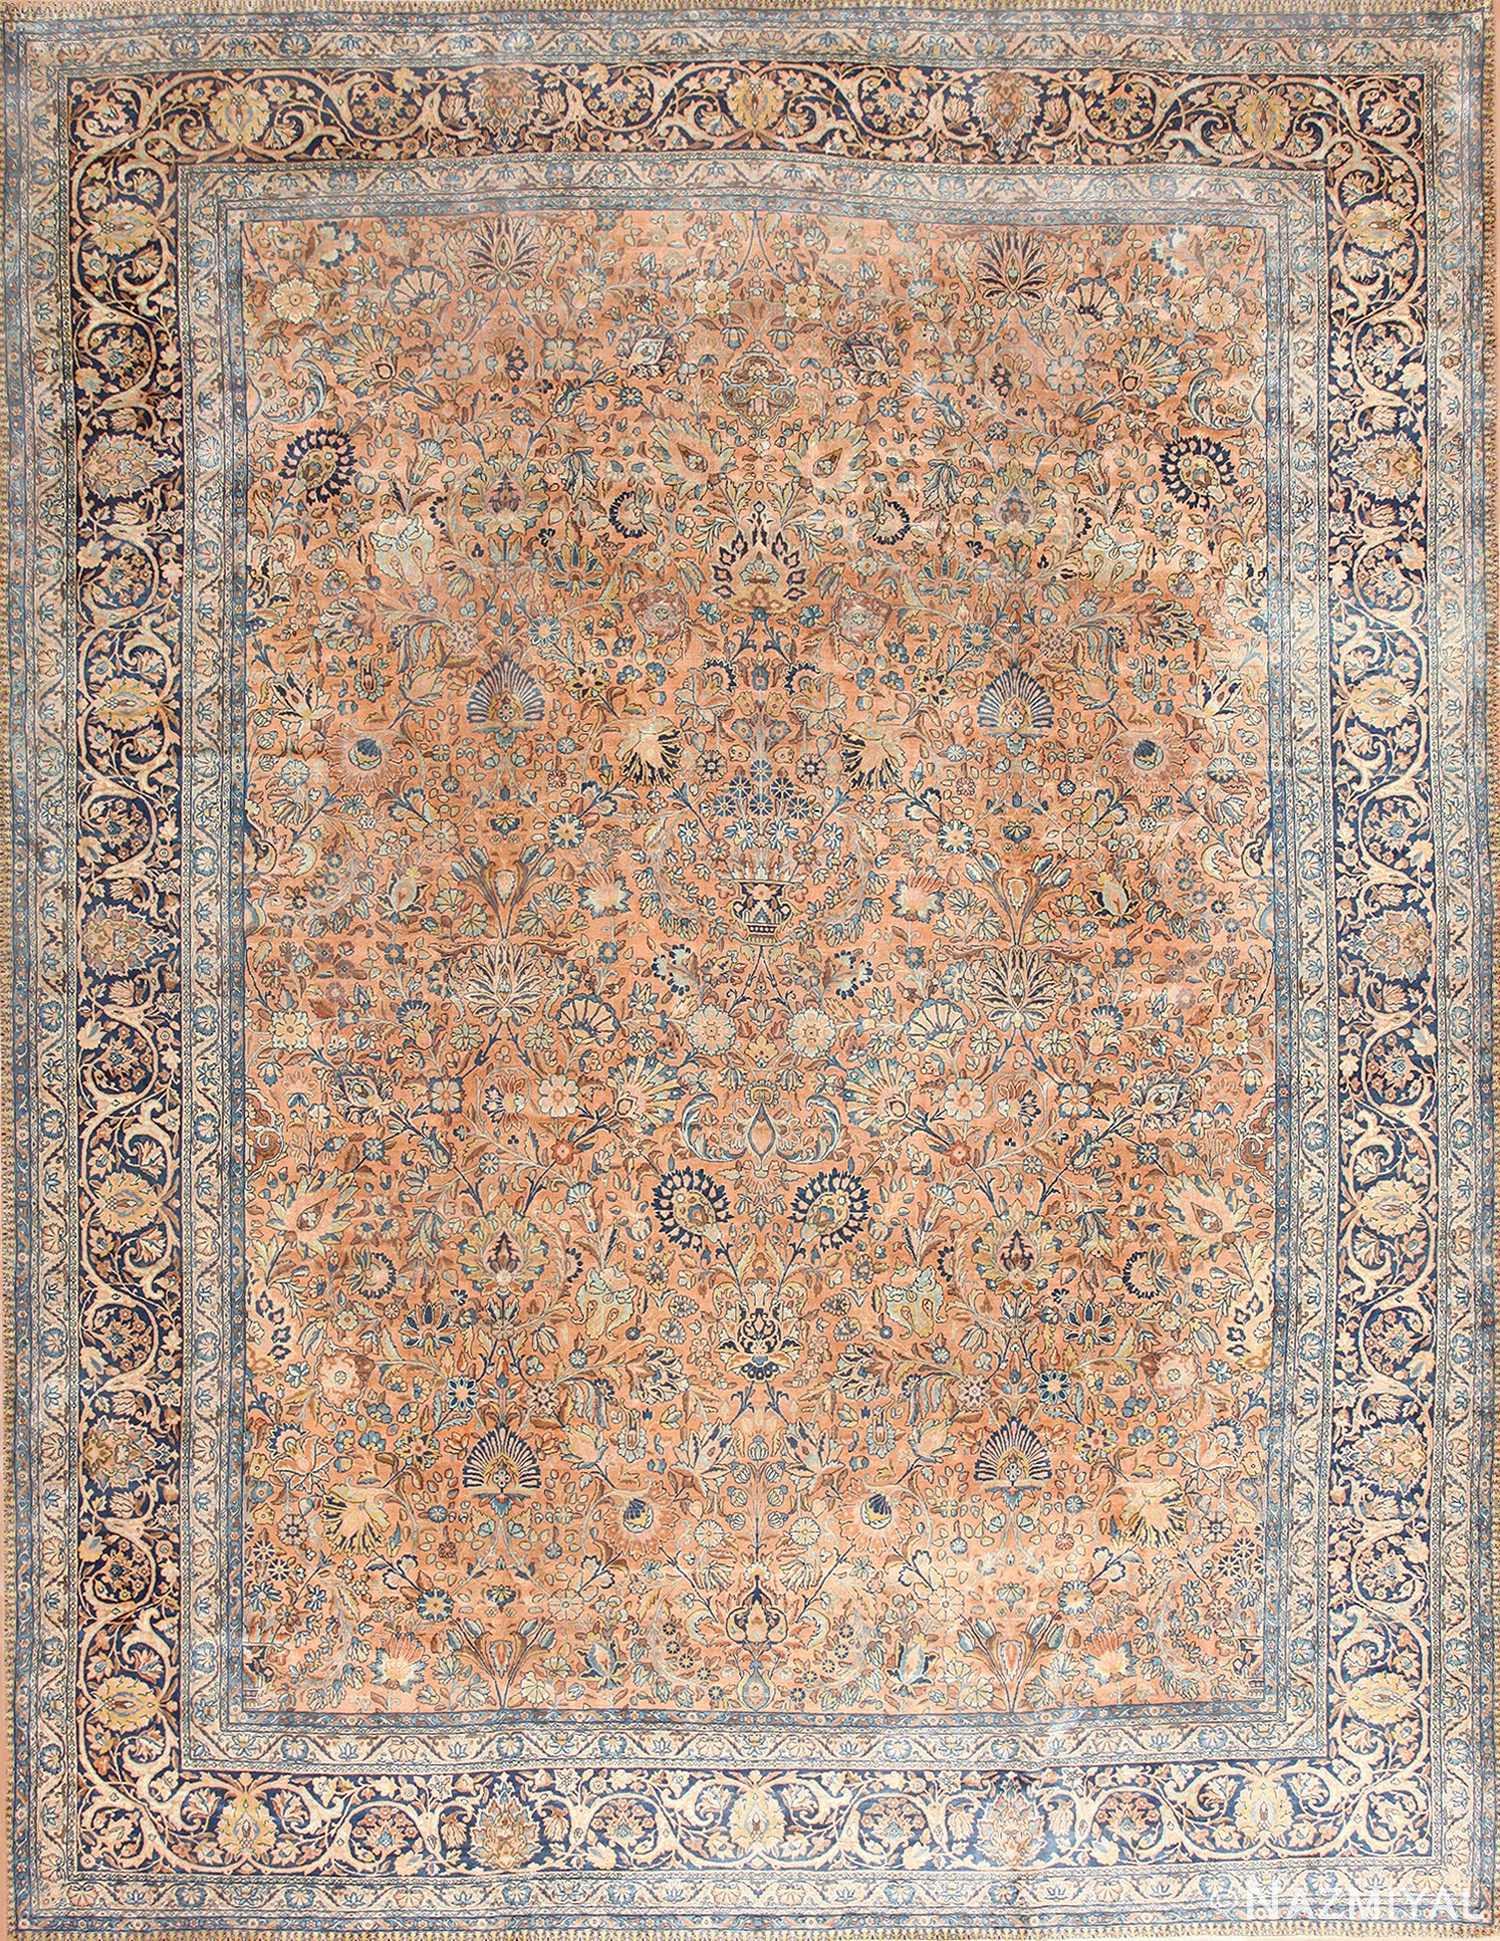 Large Antique Persian Kerman Rug 50411